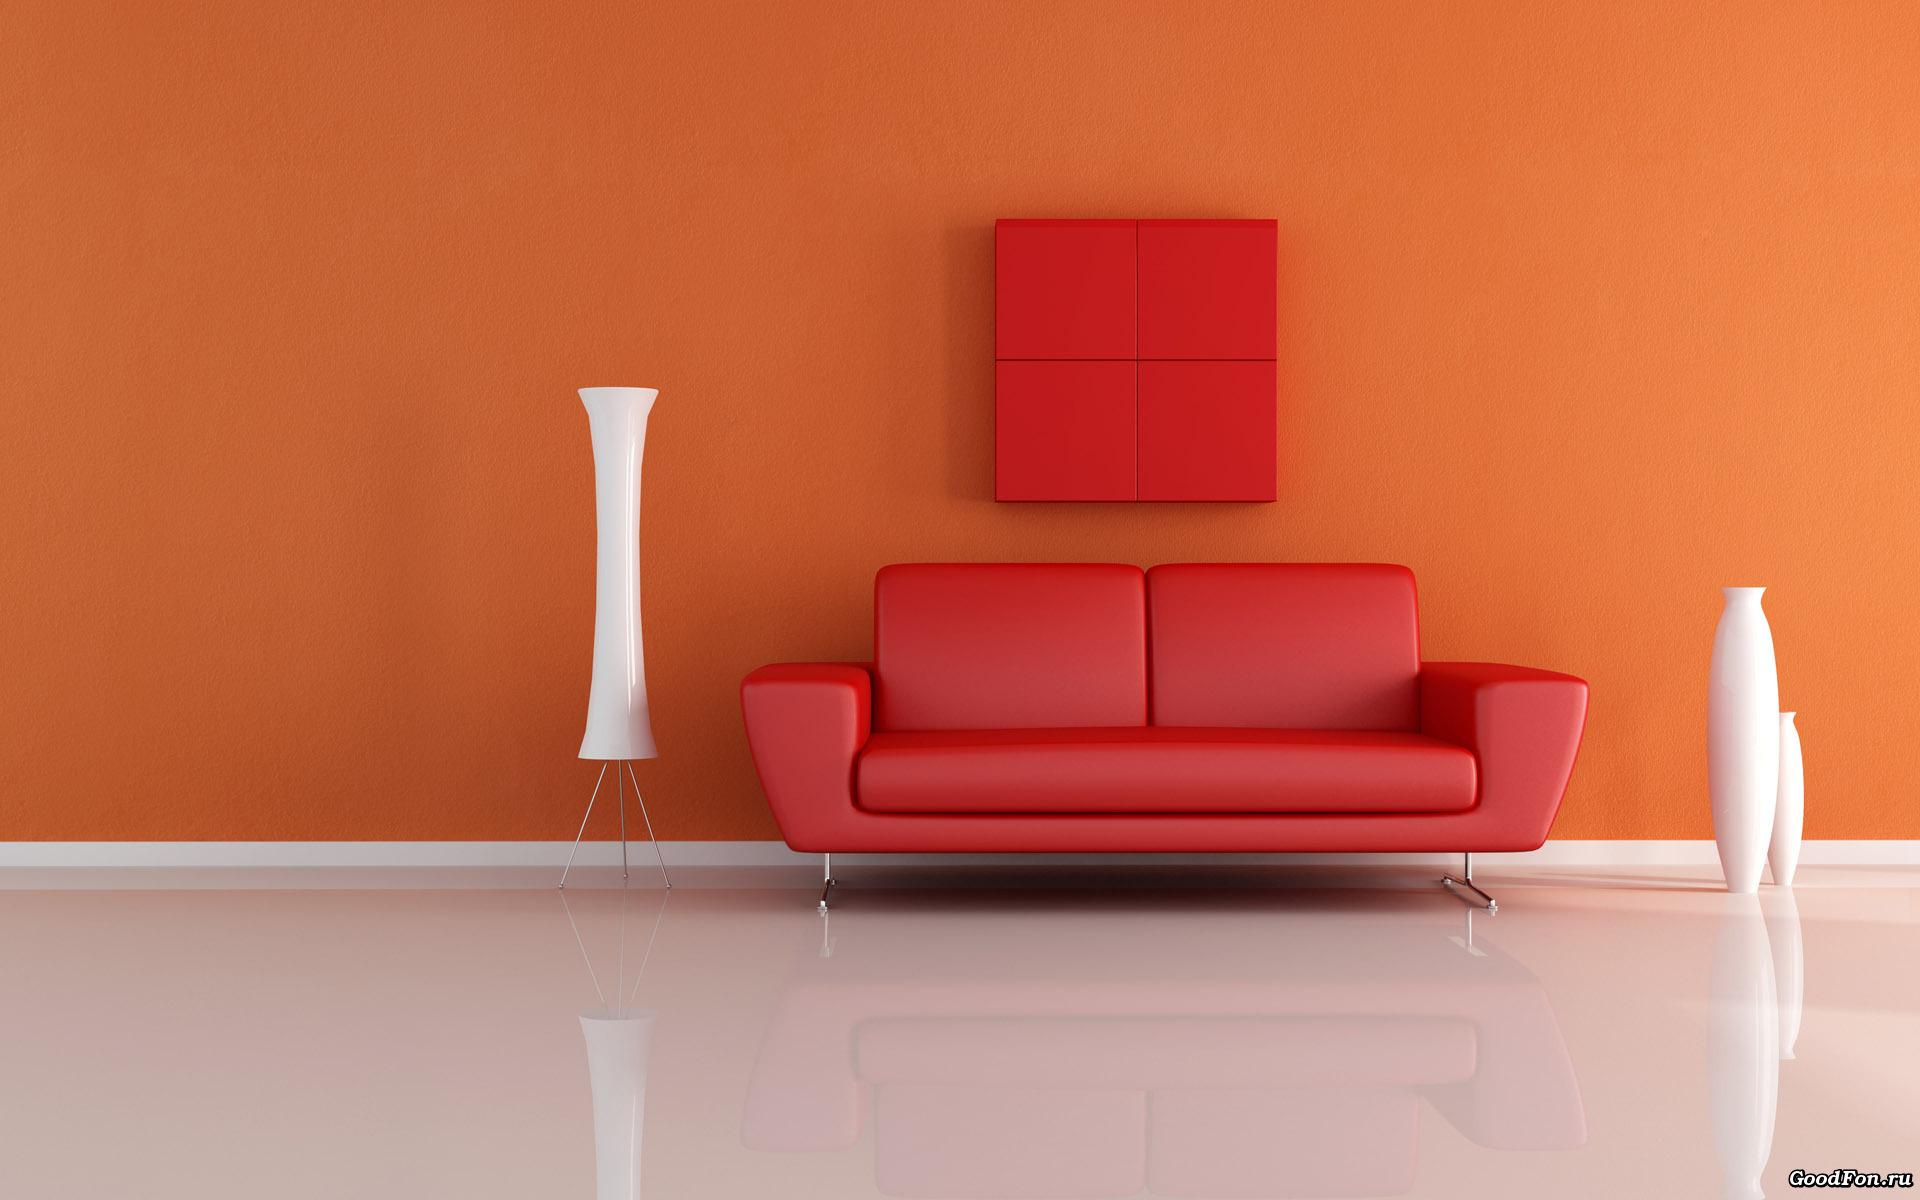 интерьер диван комната  № 3531331 загрузить